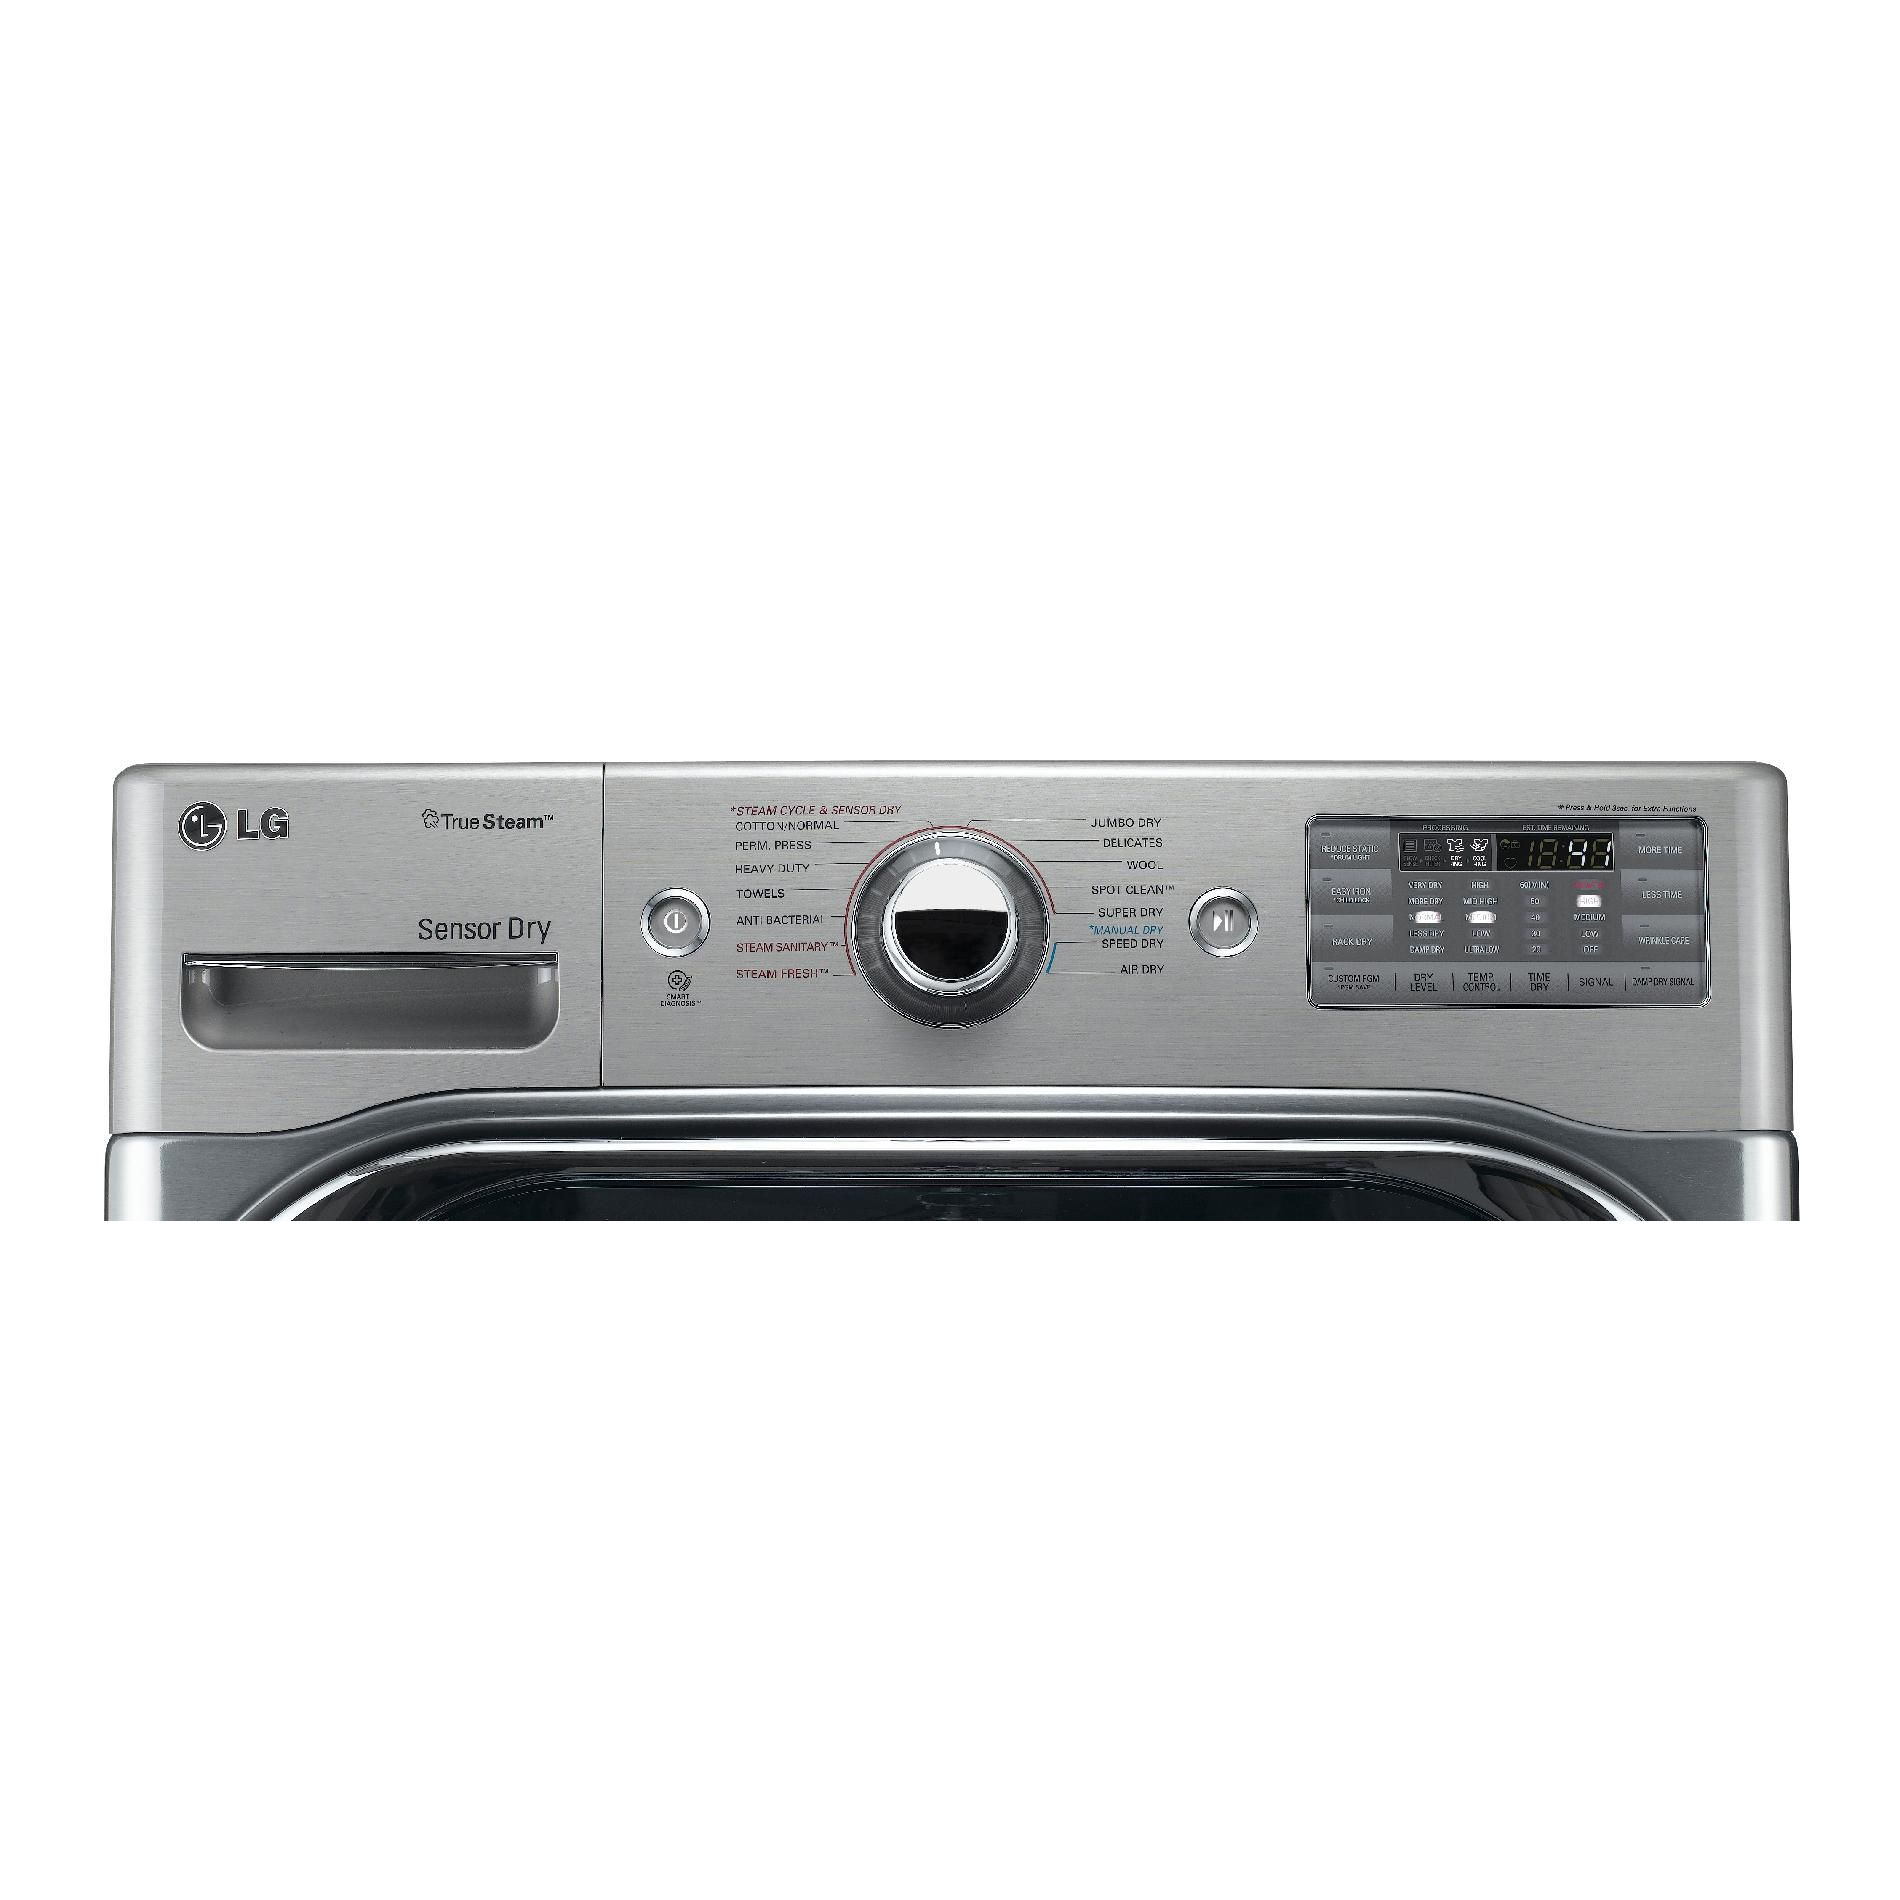 LG DLEX8000V 9.0 cu. ft. Mega-Capacity Steam Electric Dryer w/ Sensor Dry - Graphite Steel